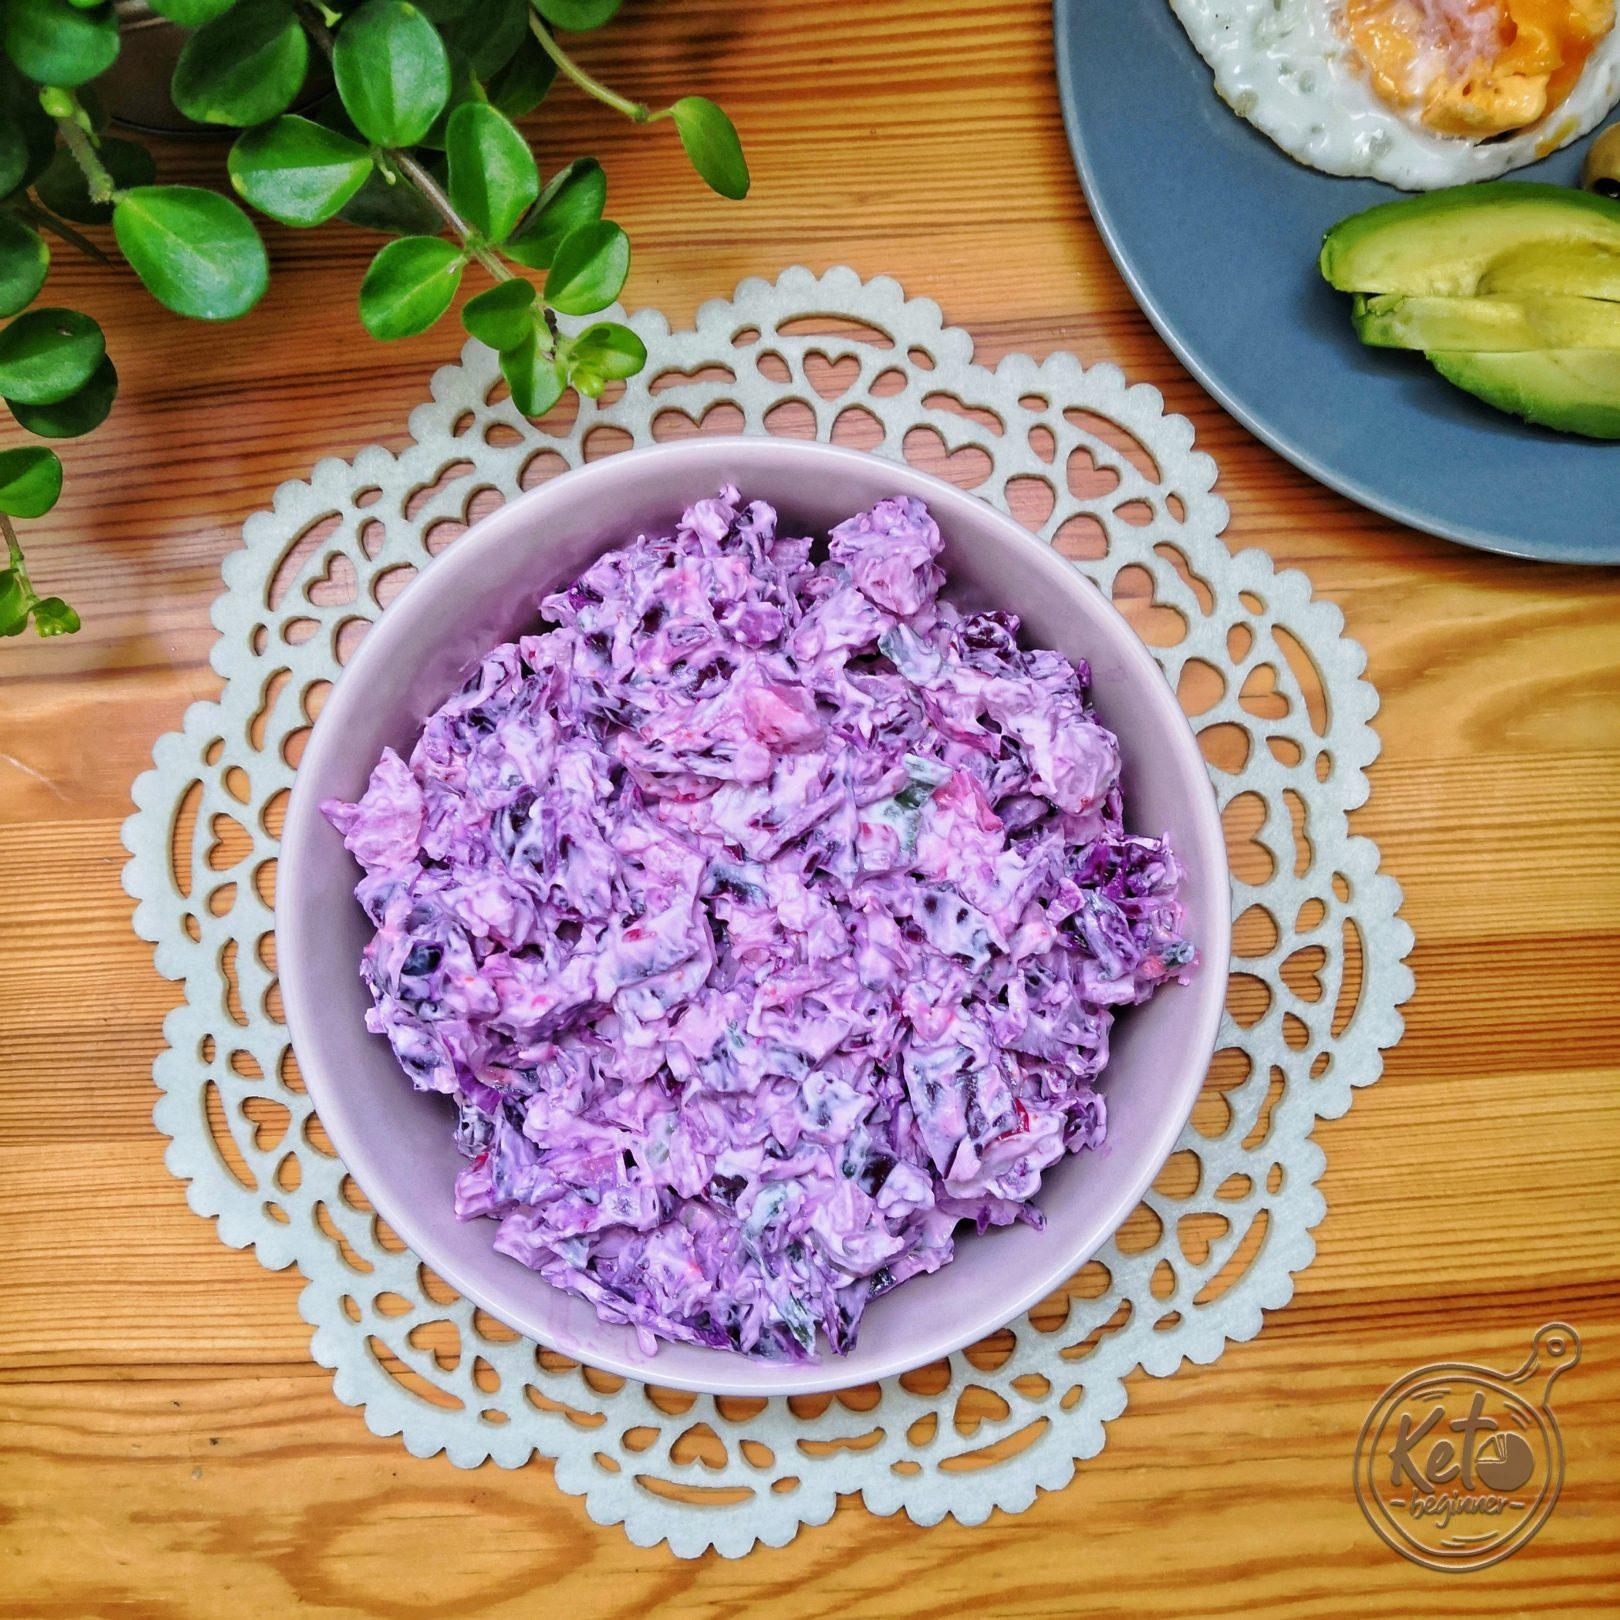 Purple Low-Carb Coleslaw